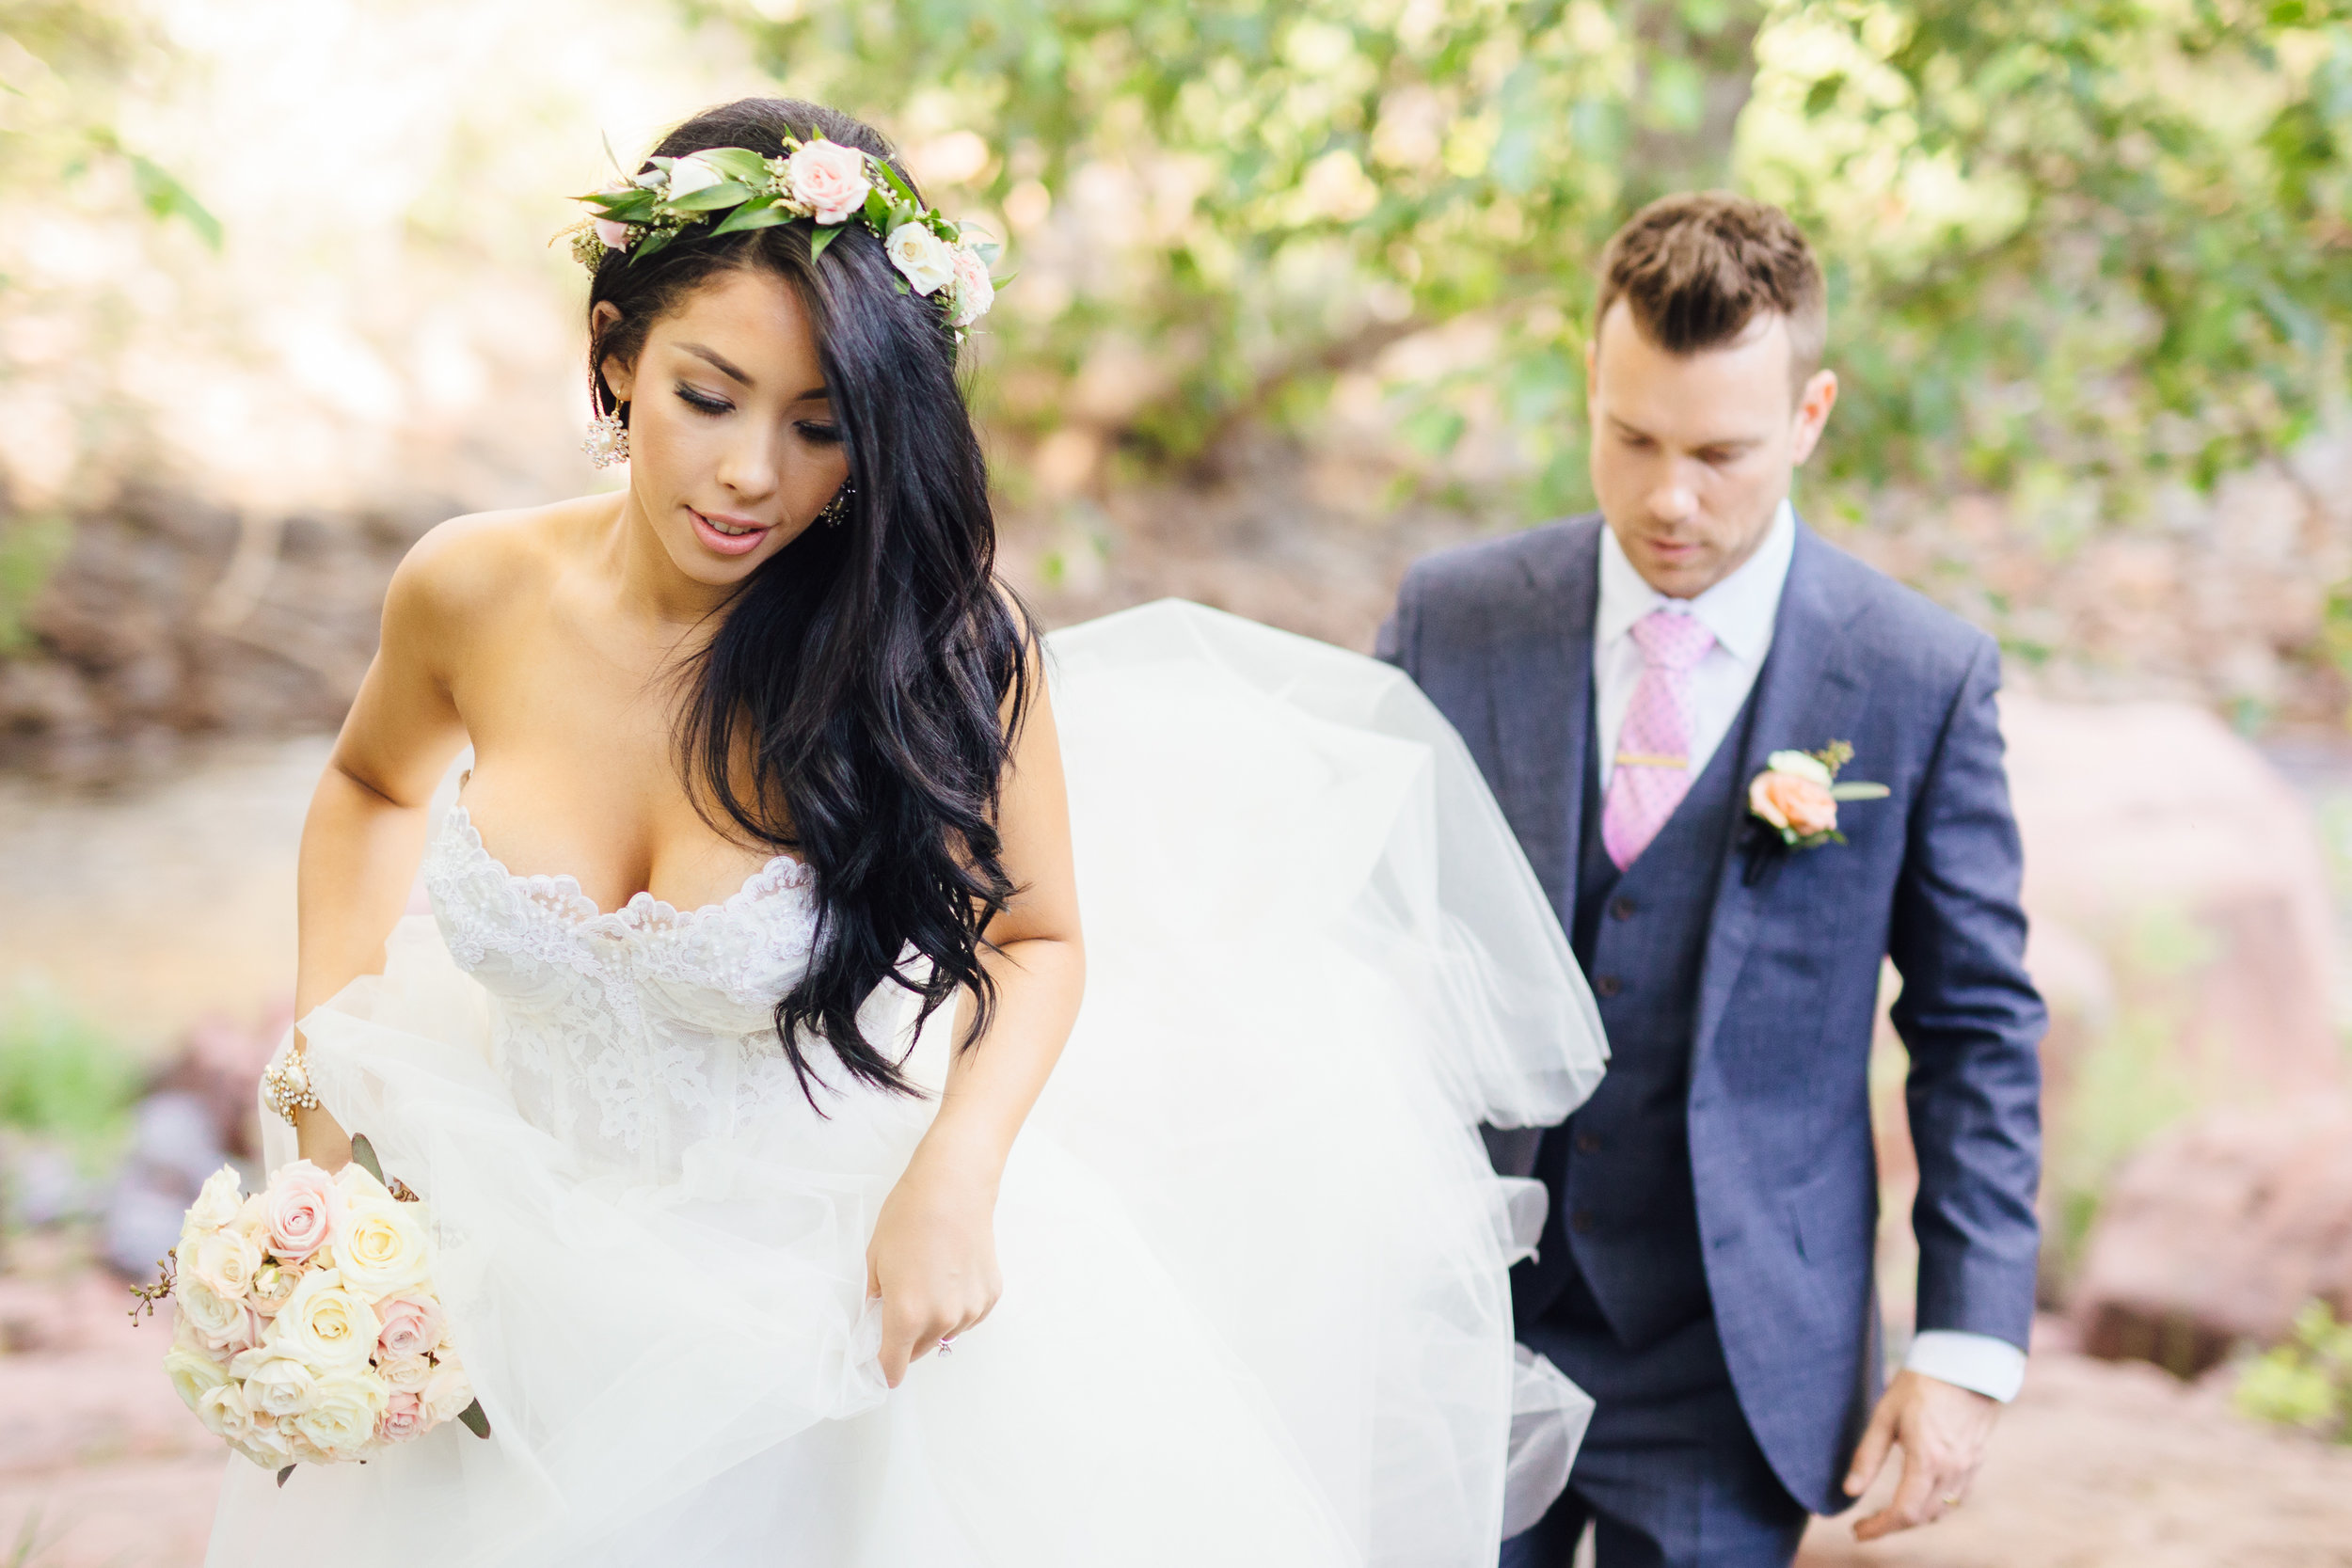 LMW-Sedona-lauberge-wedding-7546.jpg